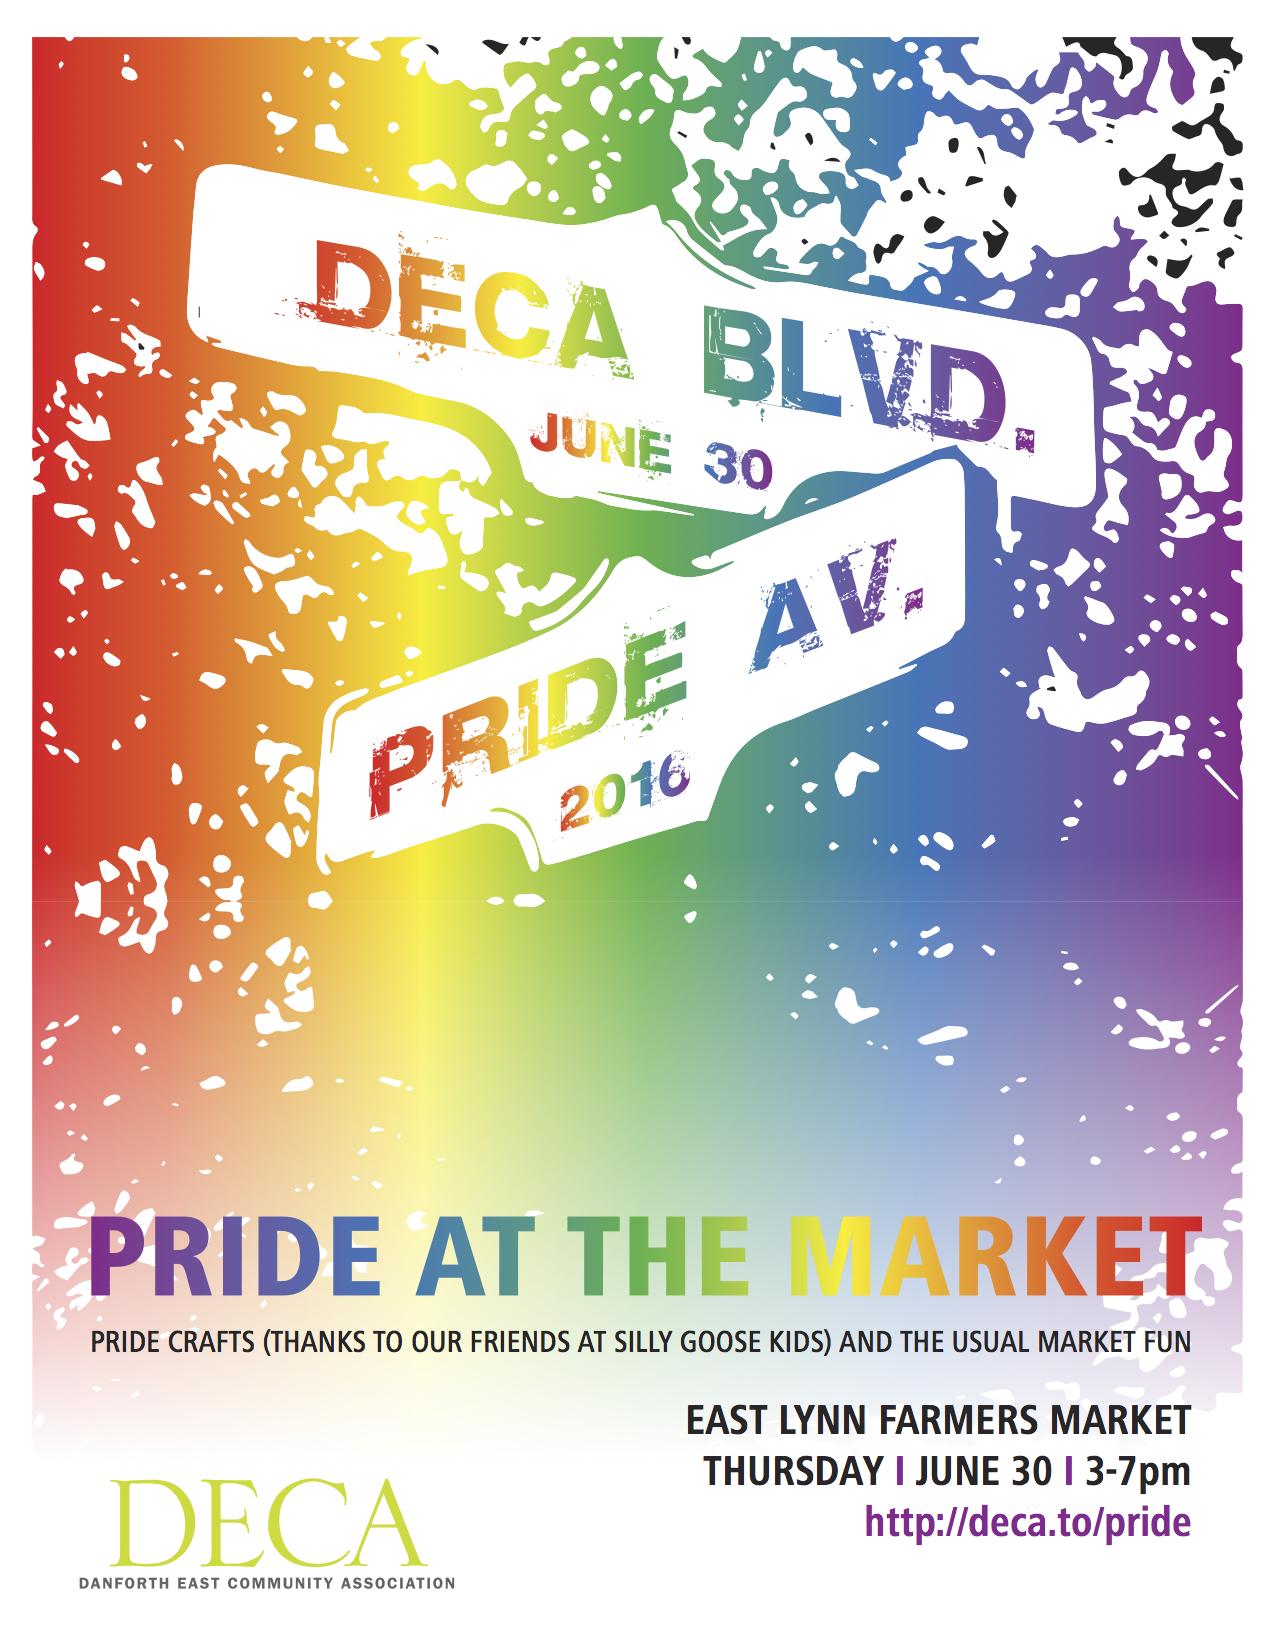 PrideAtMarket